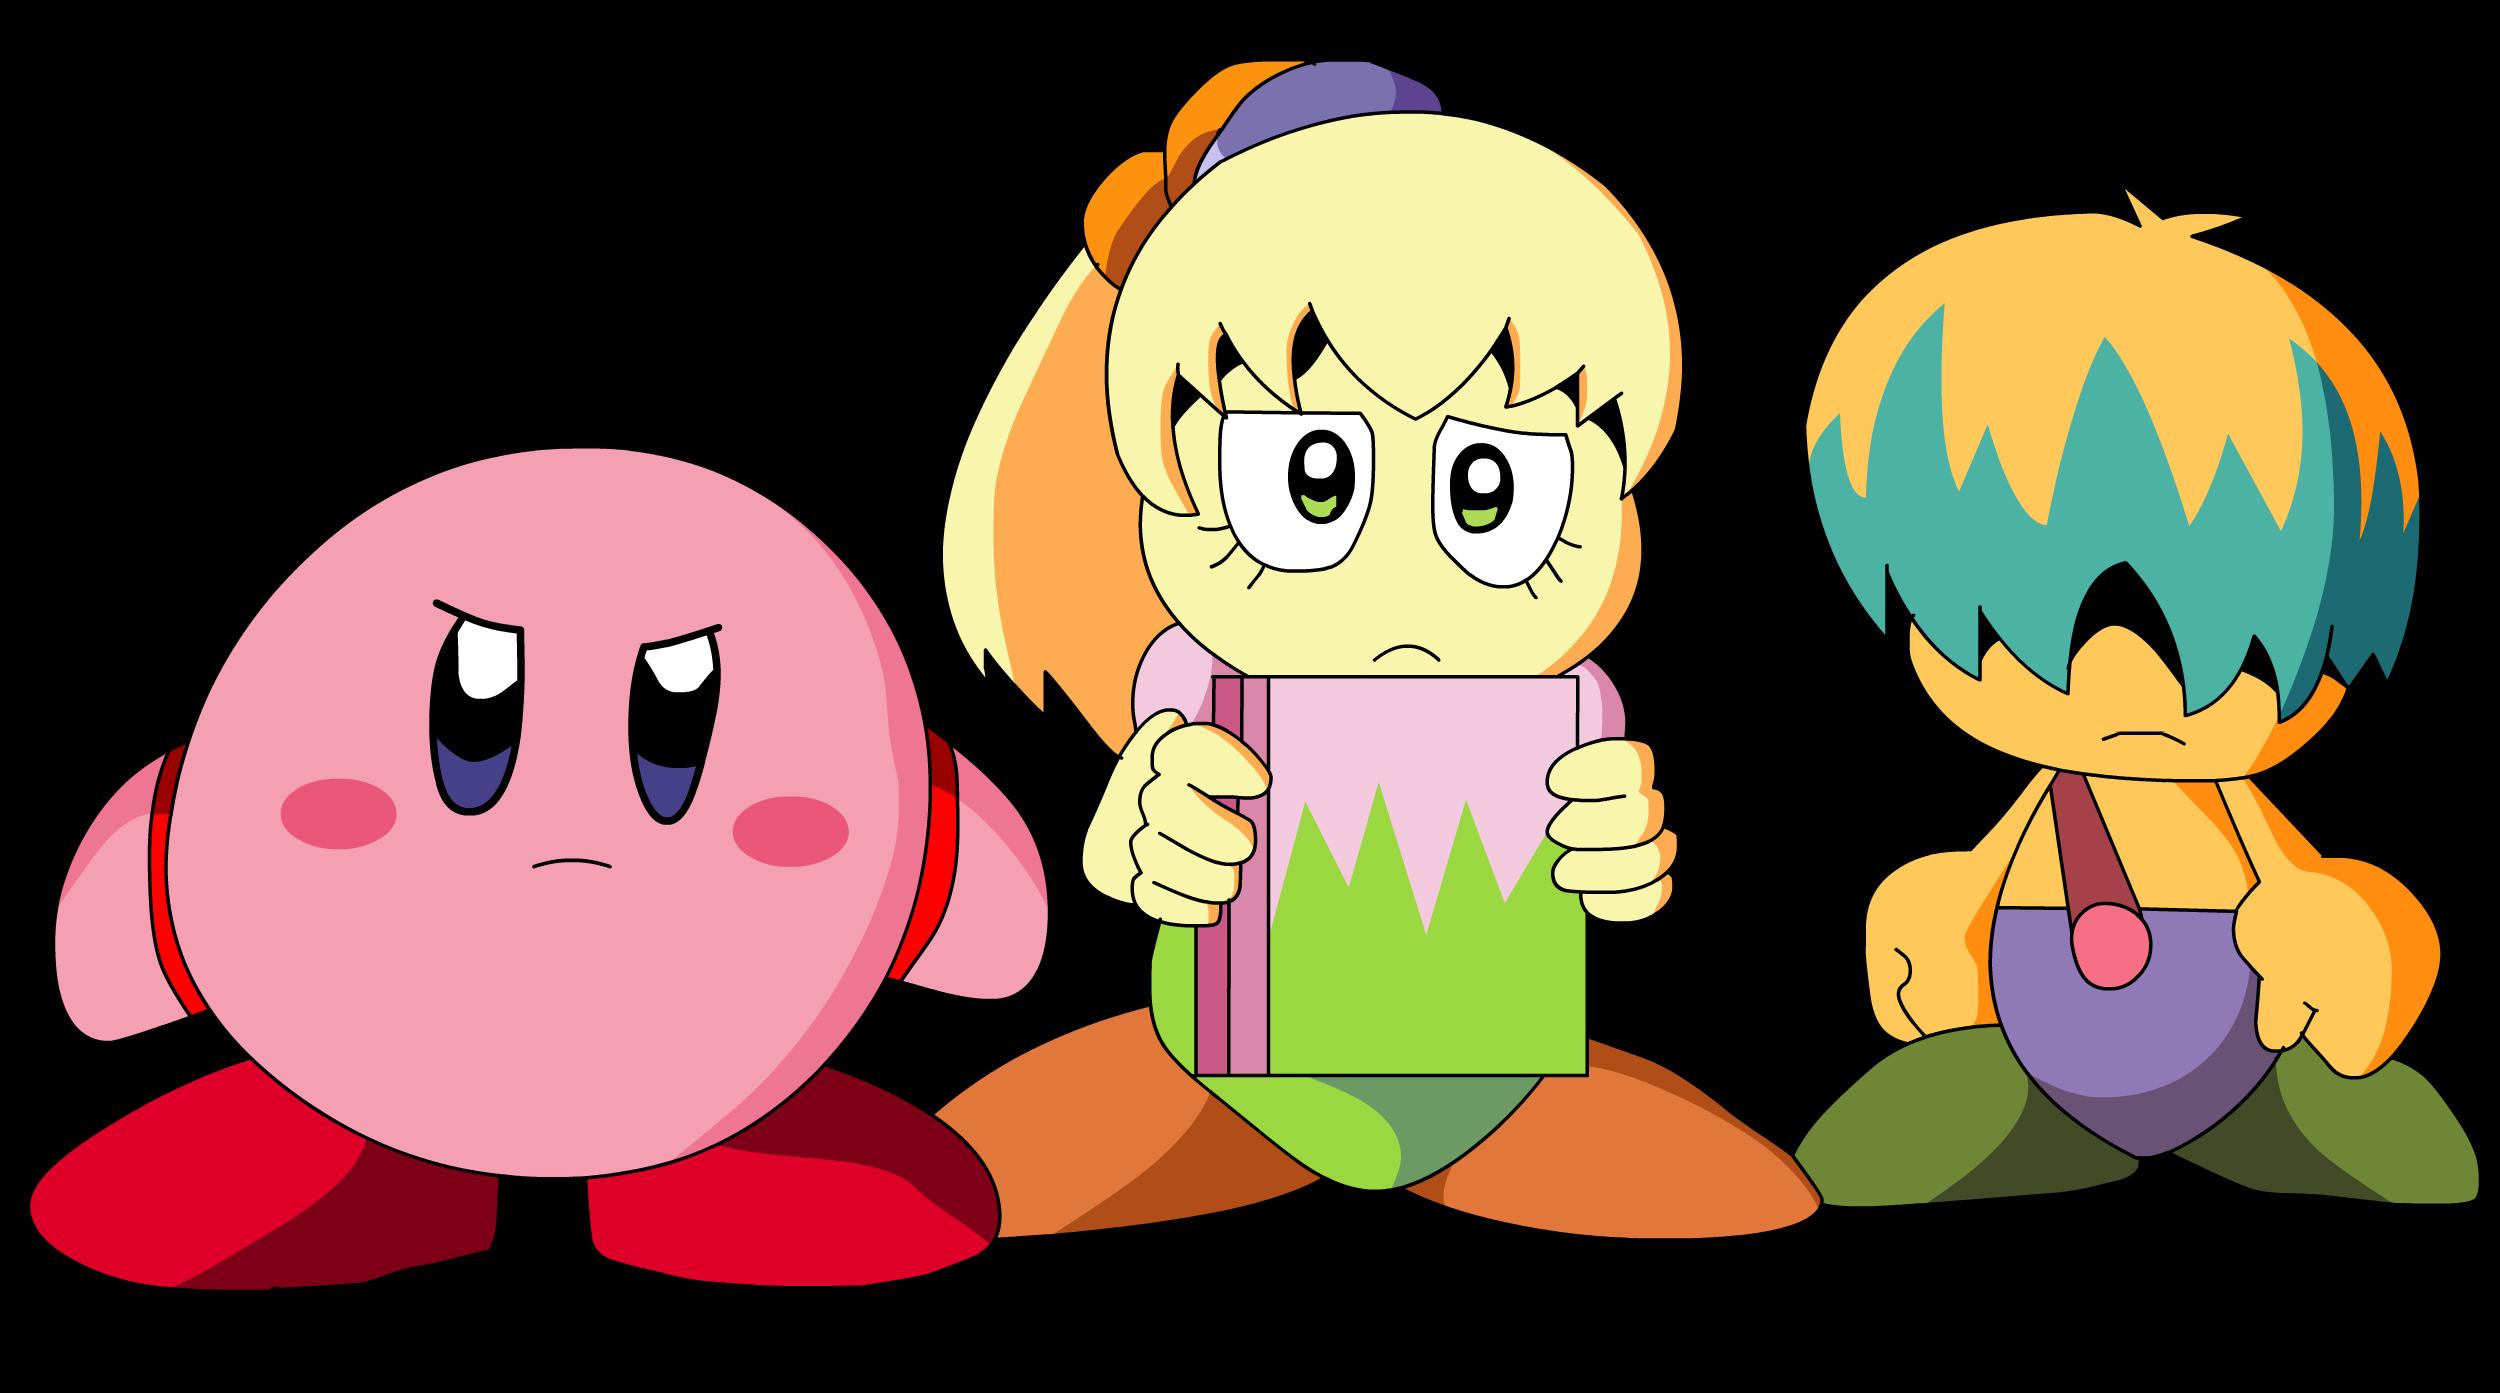 Kirby, Tiff and Tuff (Colored) by HeiseiGoji91 on DeviantArt